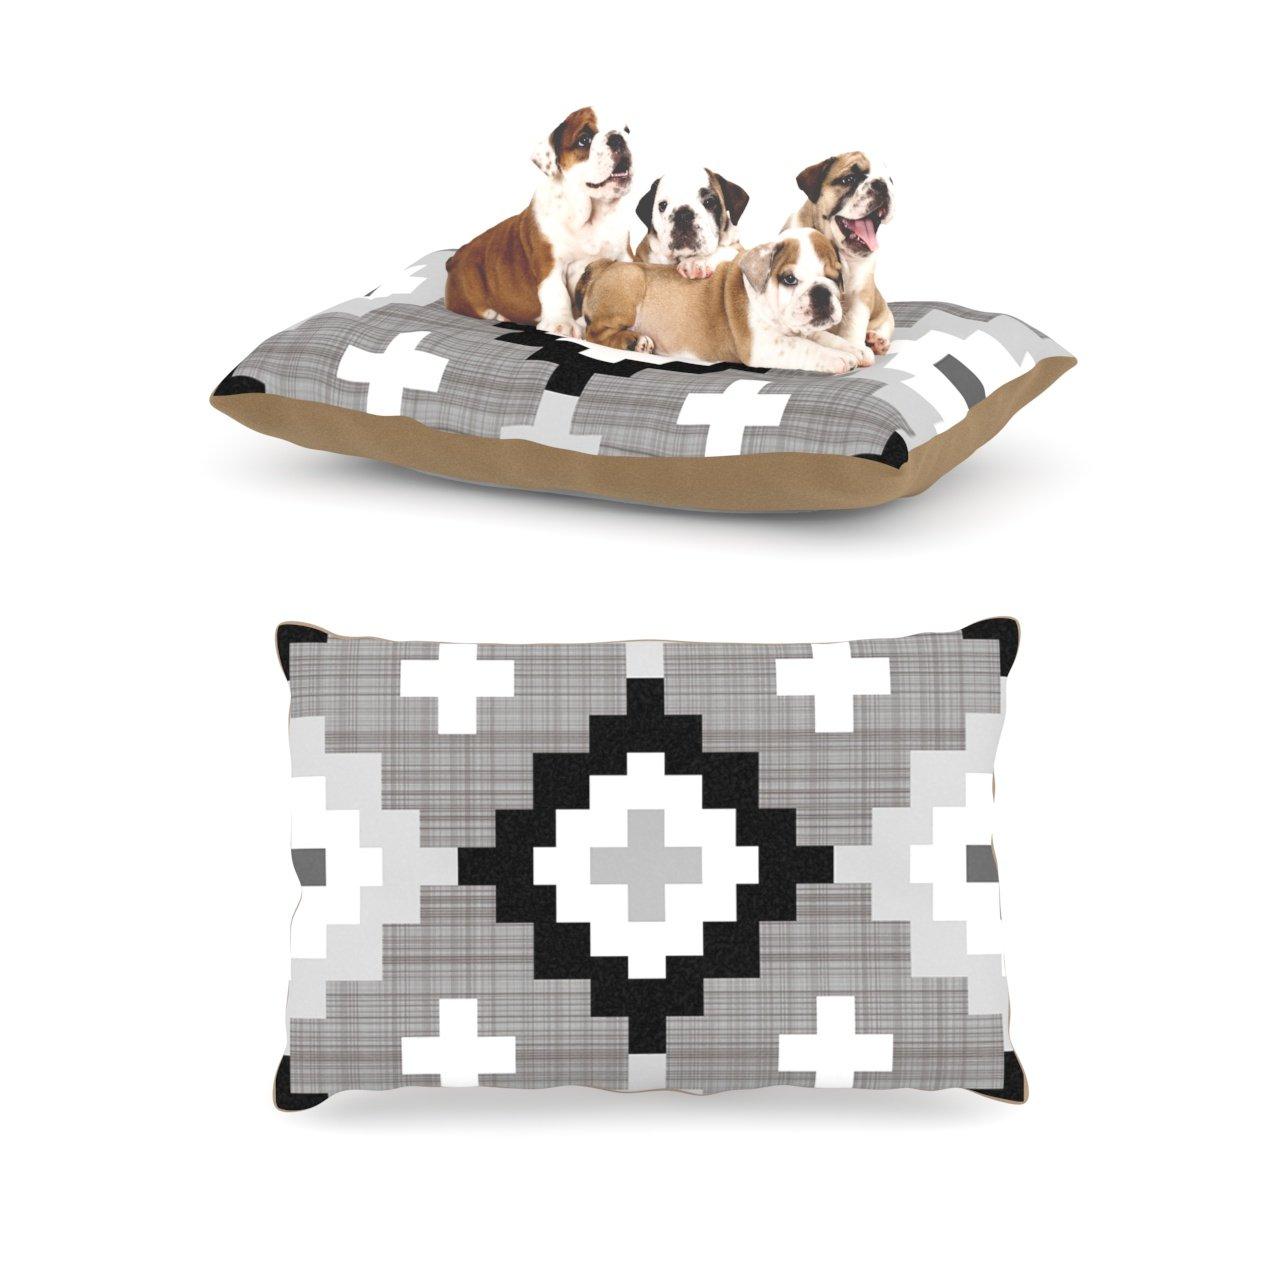 Linen Mgoldccan Large 30\ Linen Mgoldccan Large 30\ Kess InHouse Pellerina Design Linen Mgoldccan  Grey Geometric Dog Bed